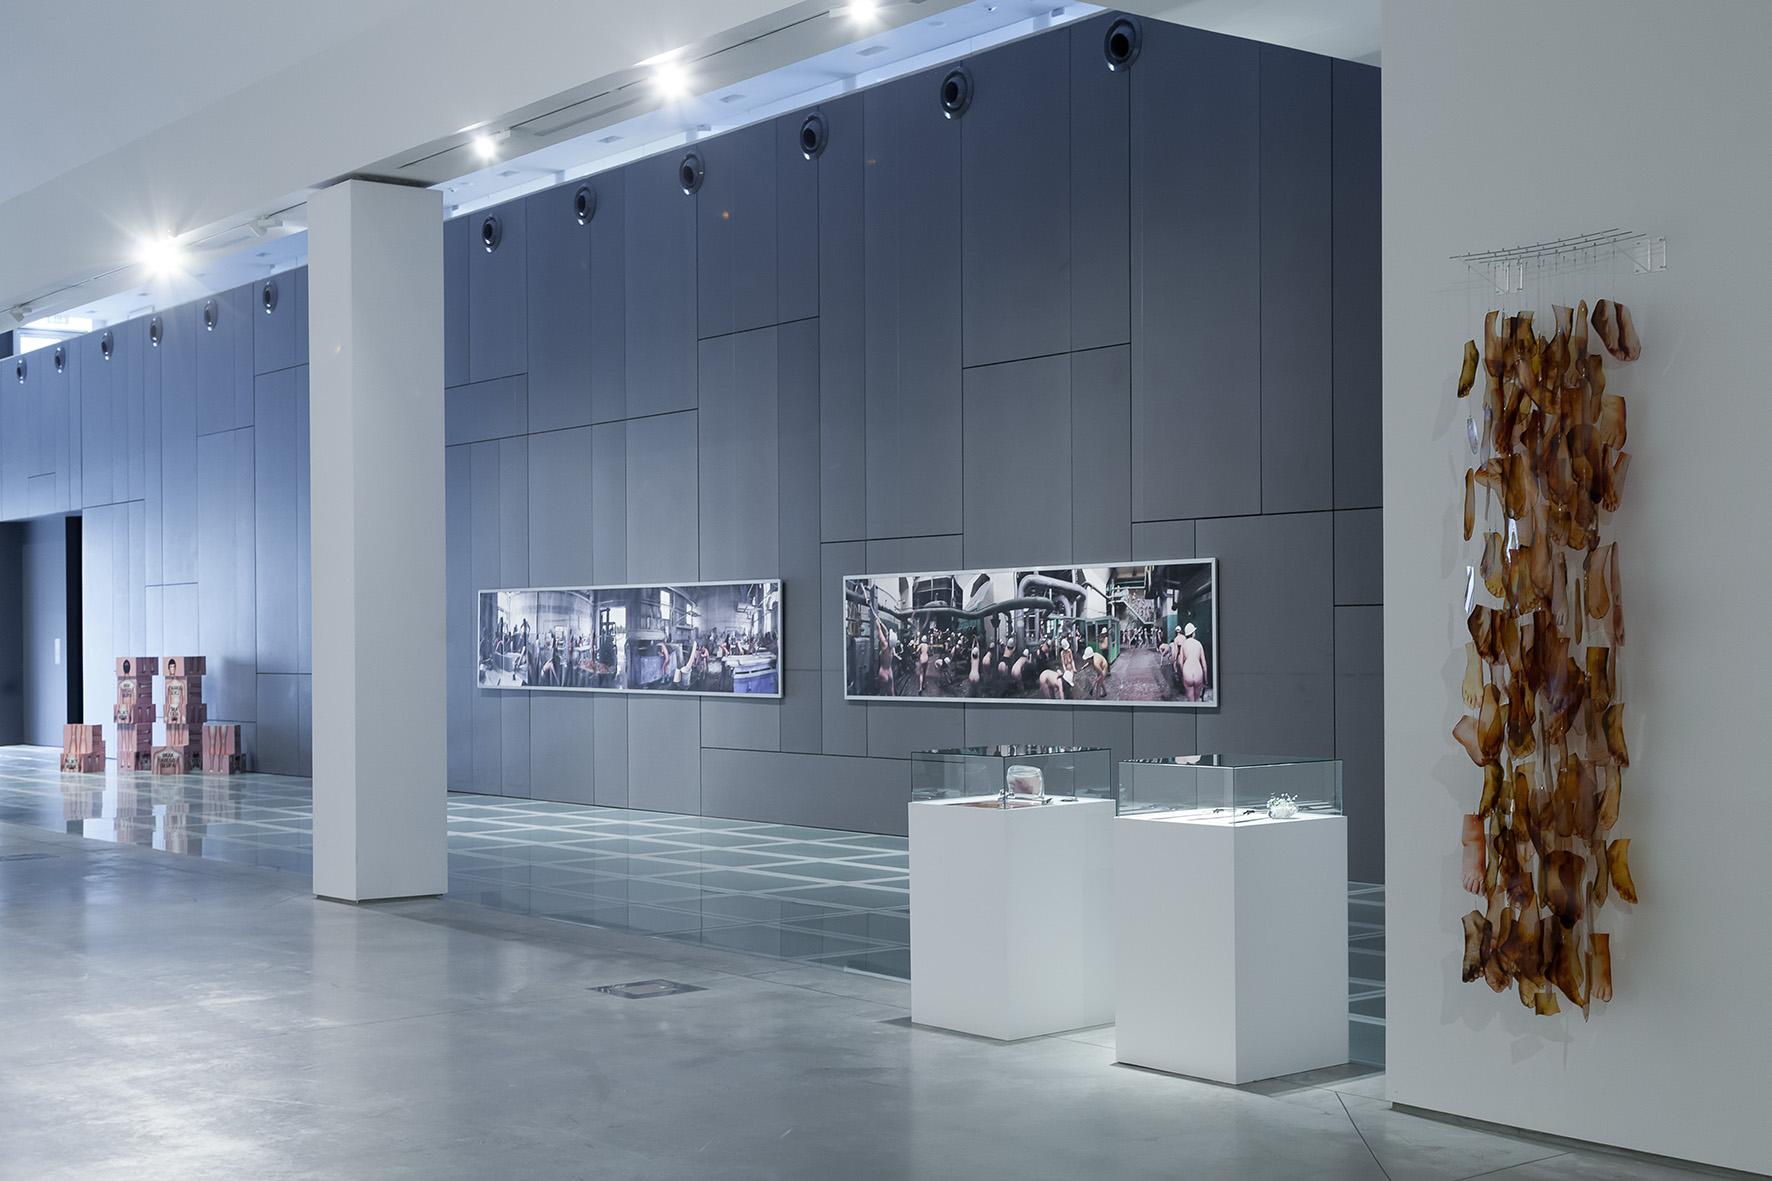 Gender wsztuce, widok wystawy